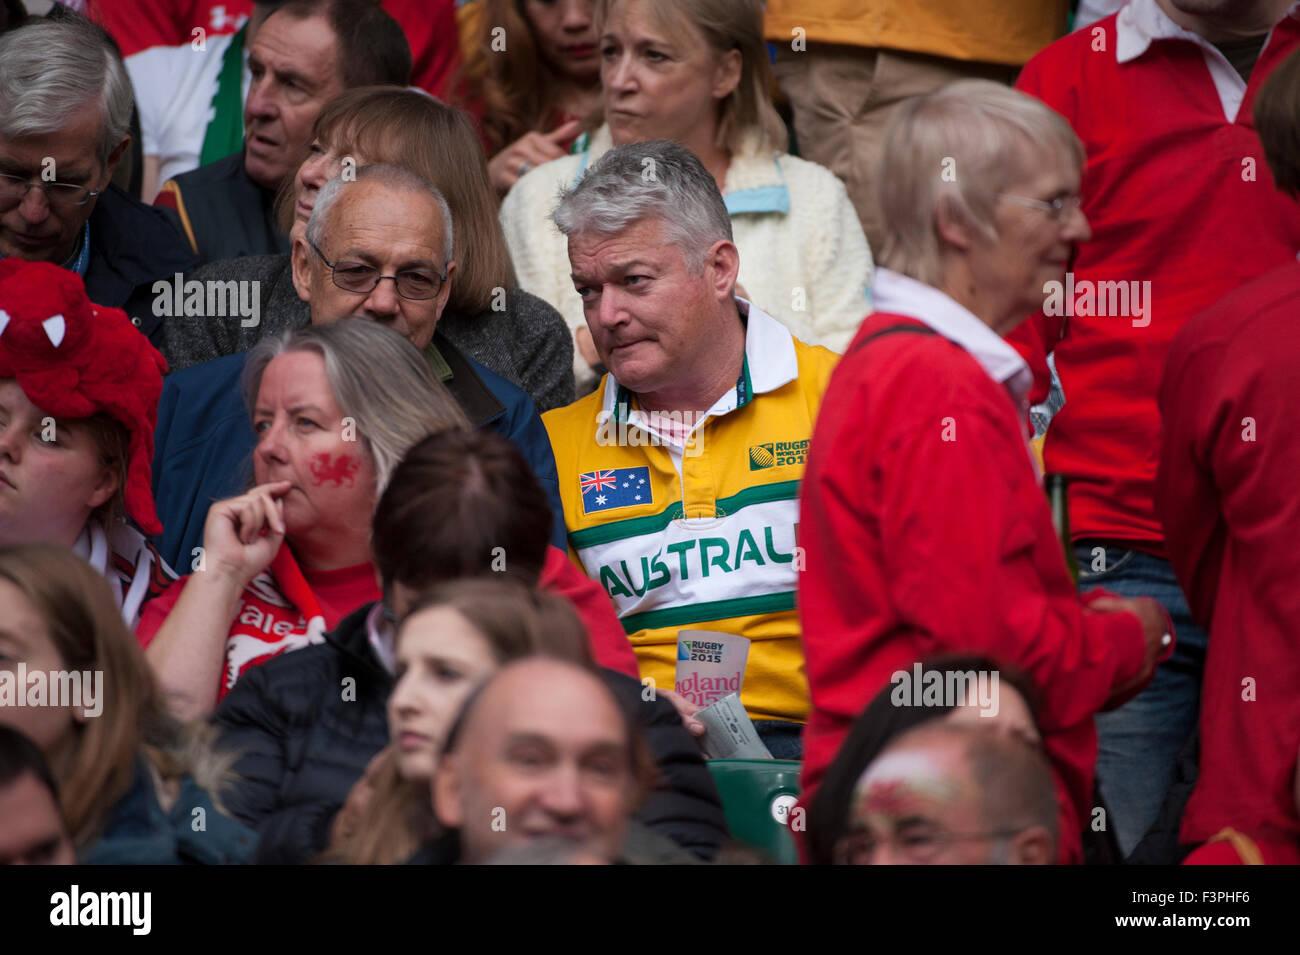 Australian support at the Australia v Wales match, Twickenham Stadium, London, UK. 10th October, 2015. - Stock Image